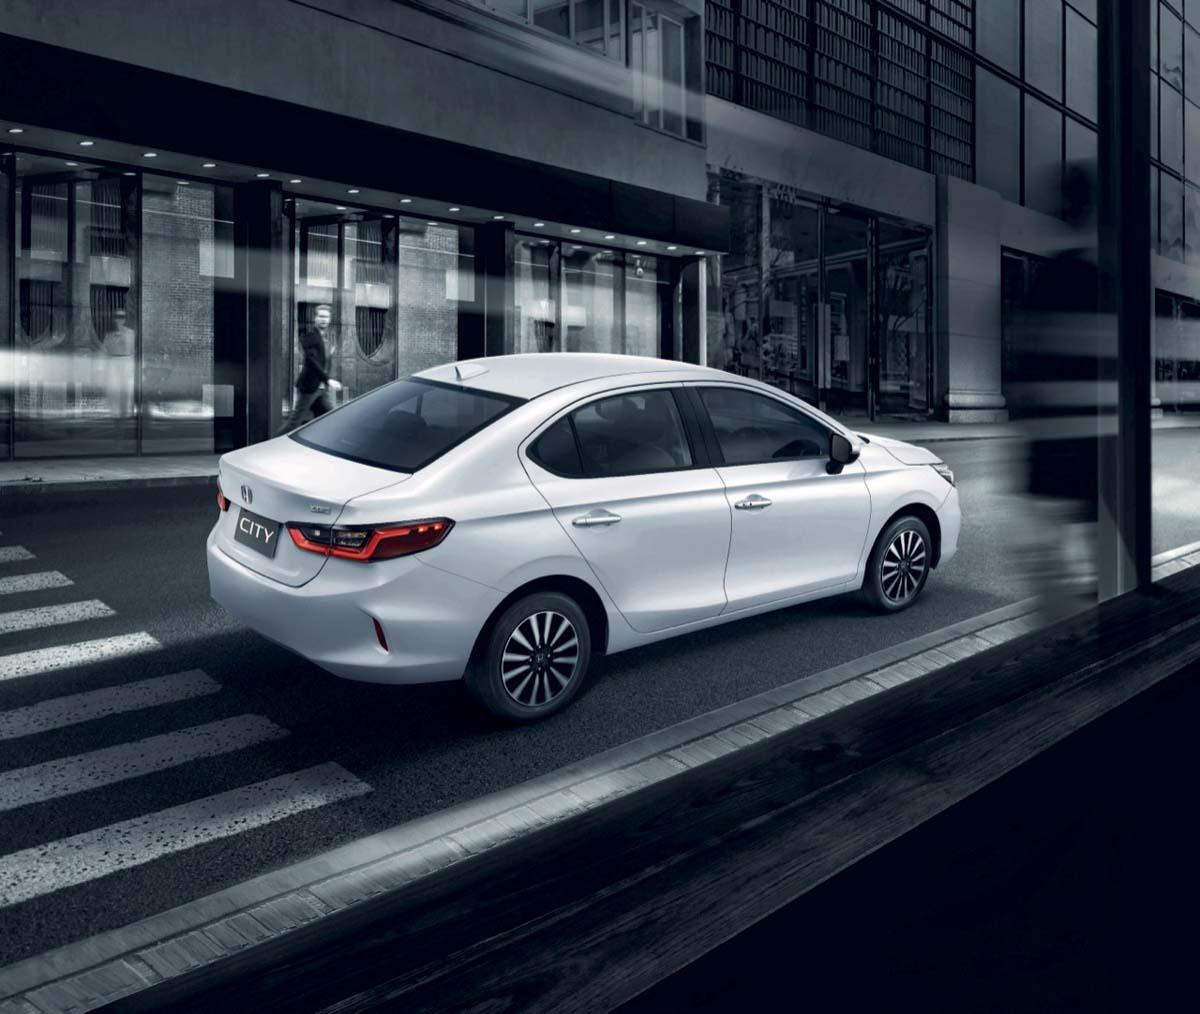 2020: 2020 Honda City Vs 2020 Hyundai Verna